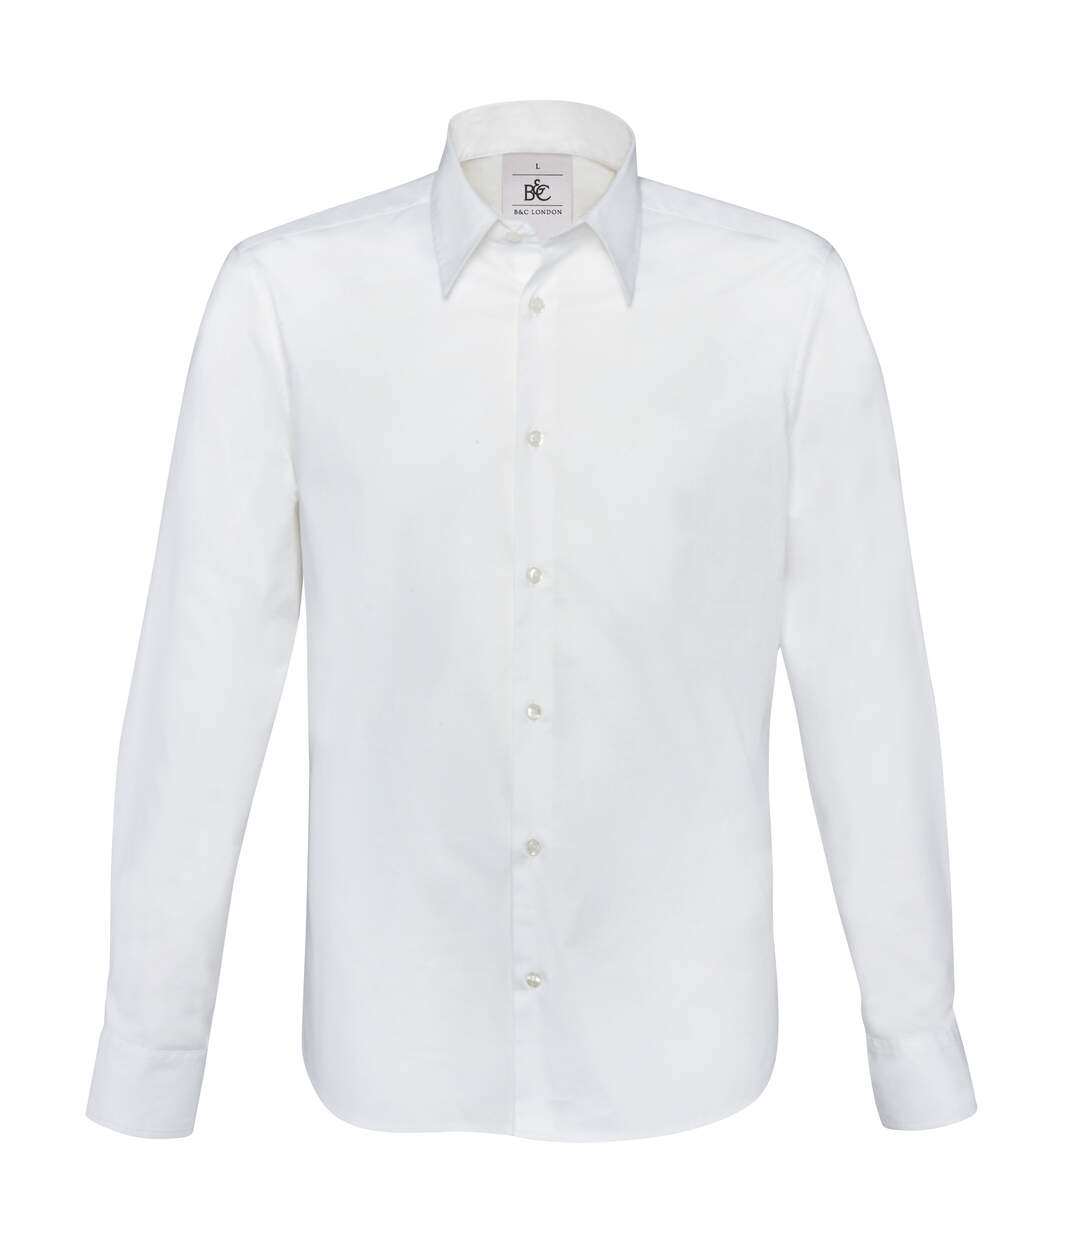 B&C Mens London Long Sleeve Poplin Shirt (White) - UTRW3040